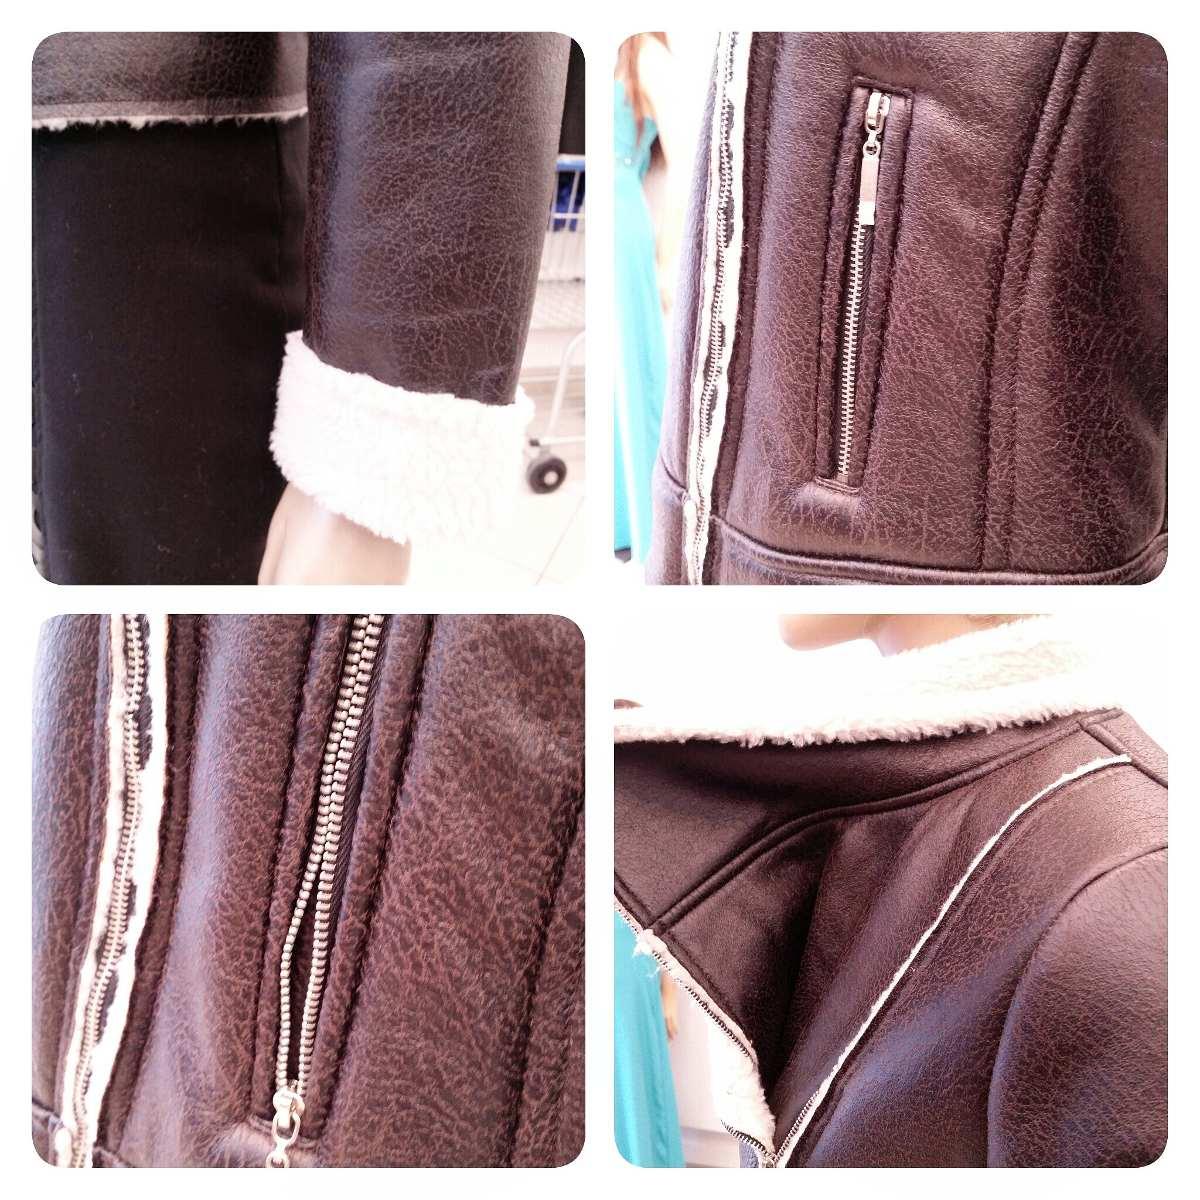 Jaqueta de couro fake tipo motoqueira curto ref. 1291